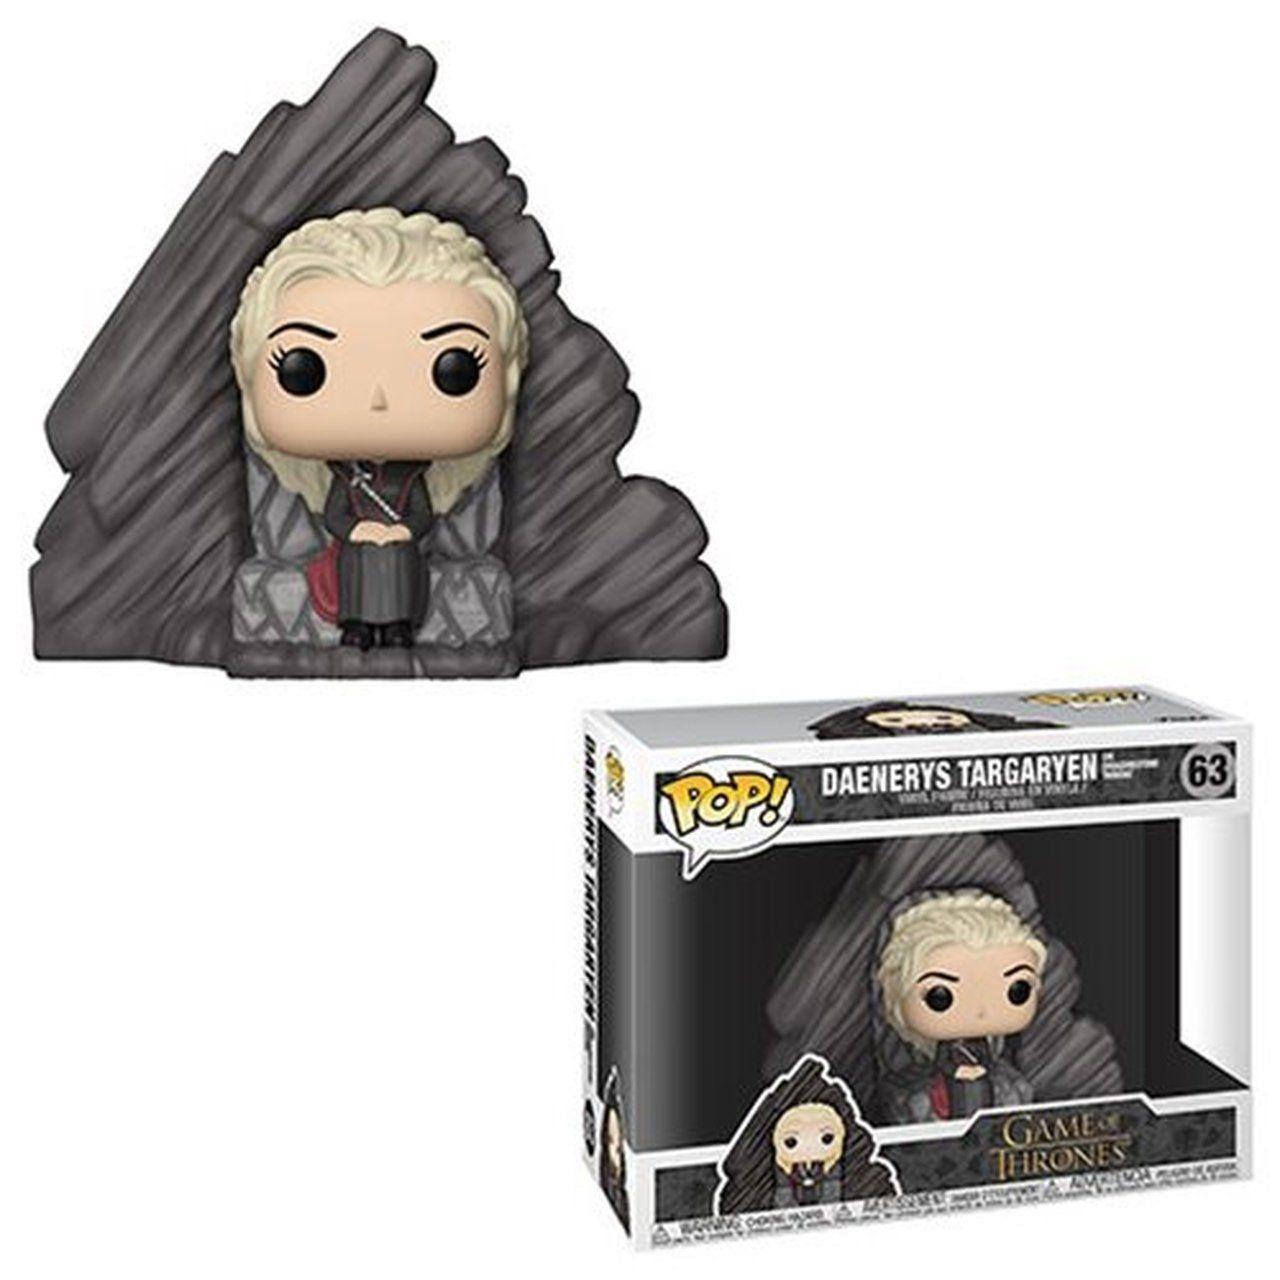 Funko Pop! Daenerys on Dragonstone Throne: Game of Thrones #63 - Funko